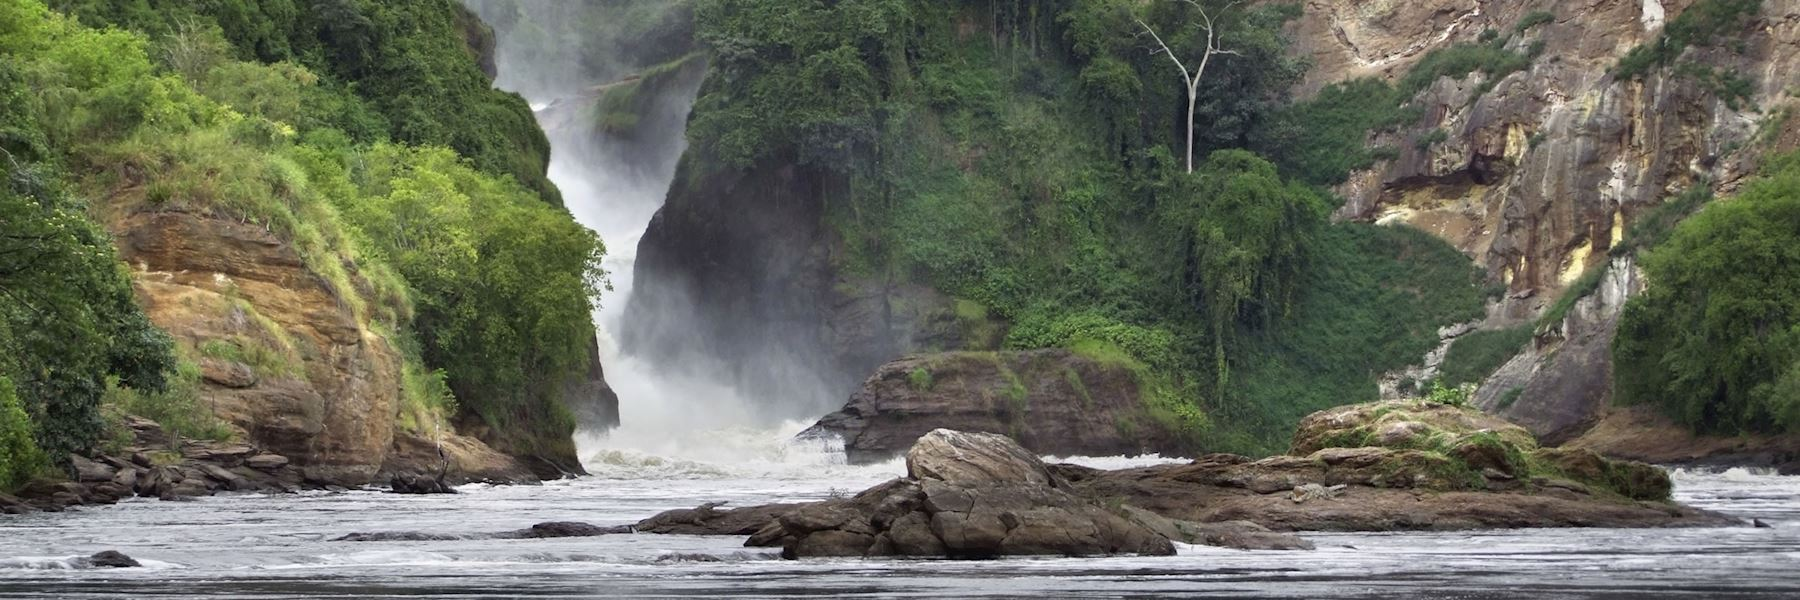 Visit Murchison Falls National Park, Uganda